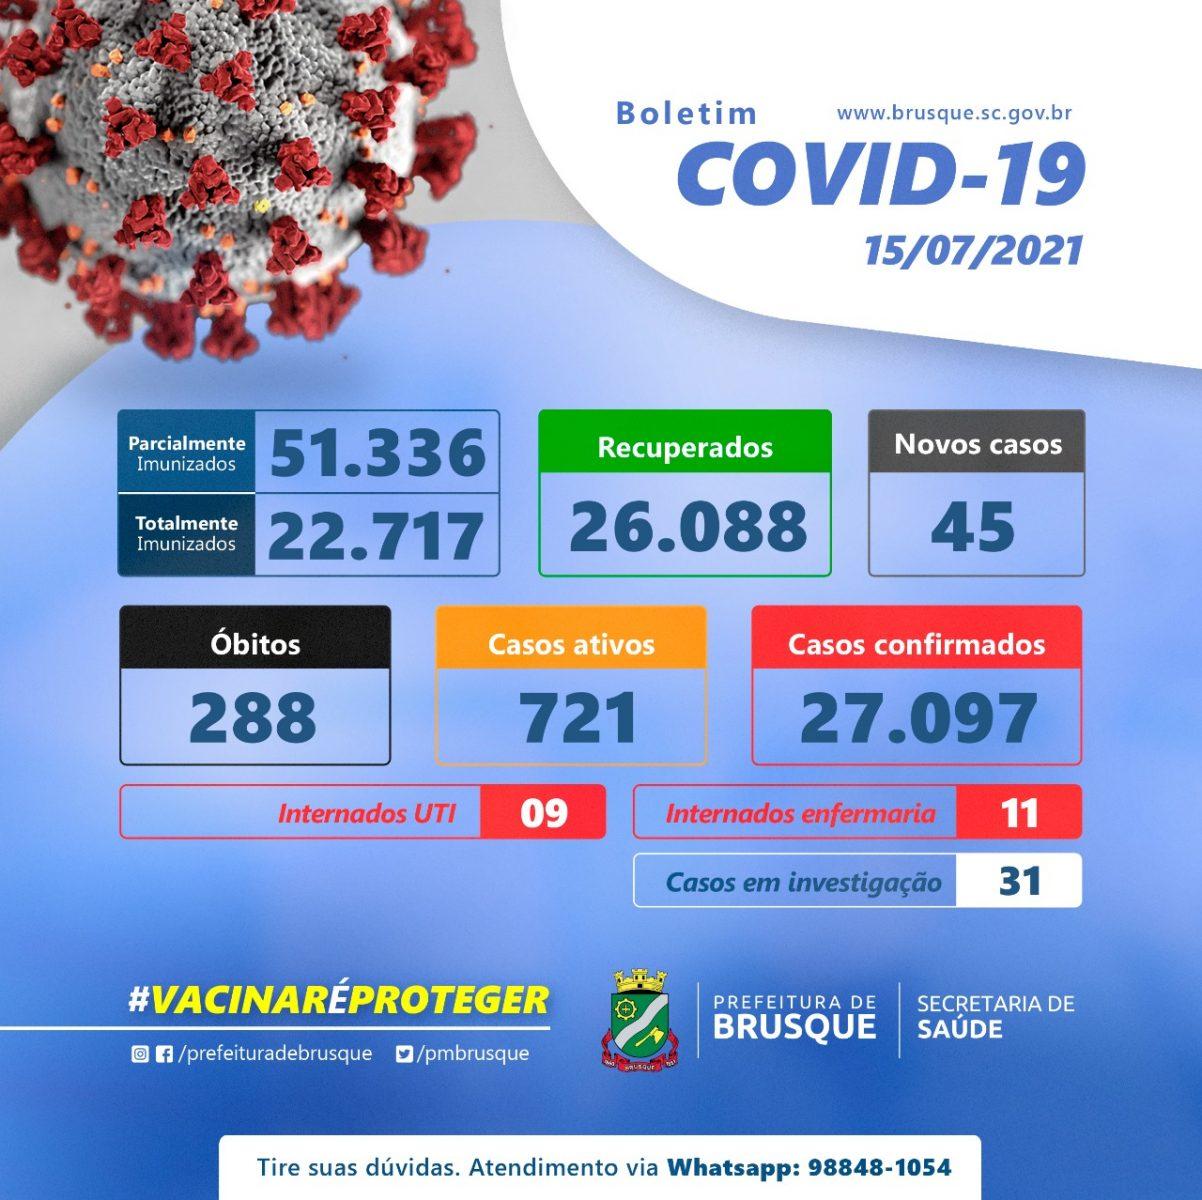 Covid-19: Confira o boletim epidemiológico desta quinta-feira (15)